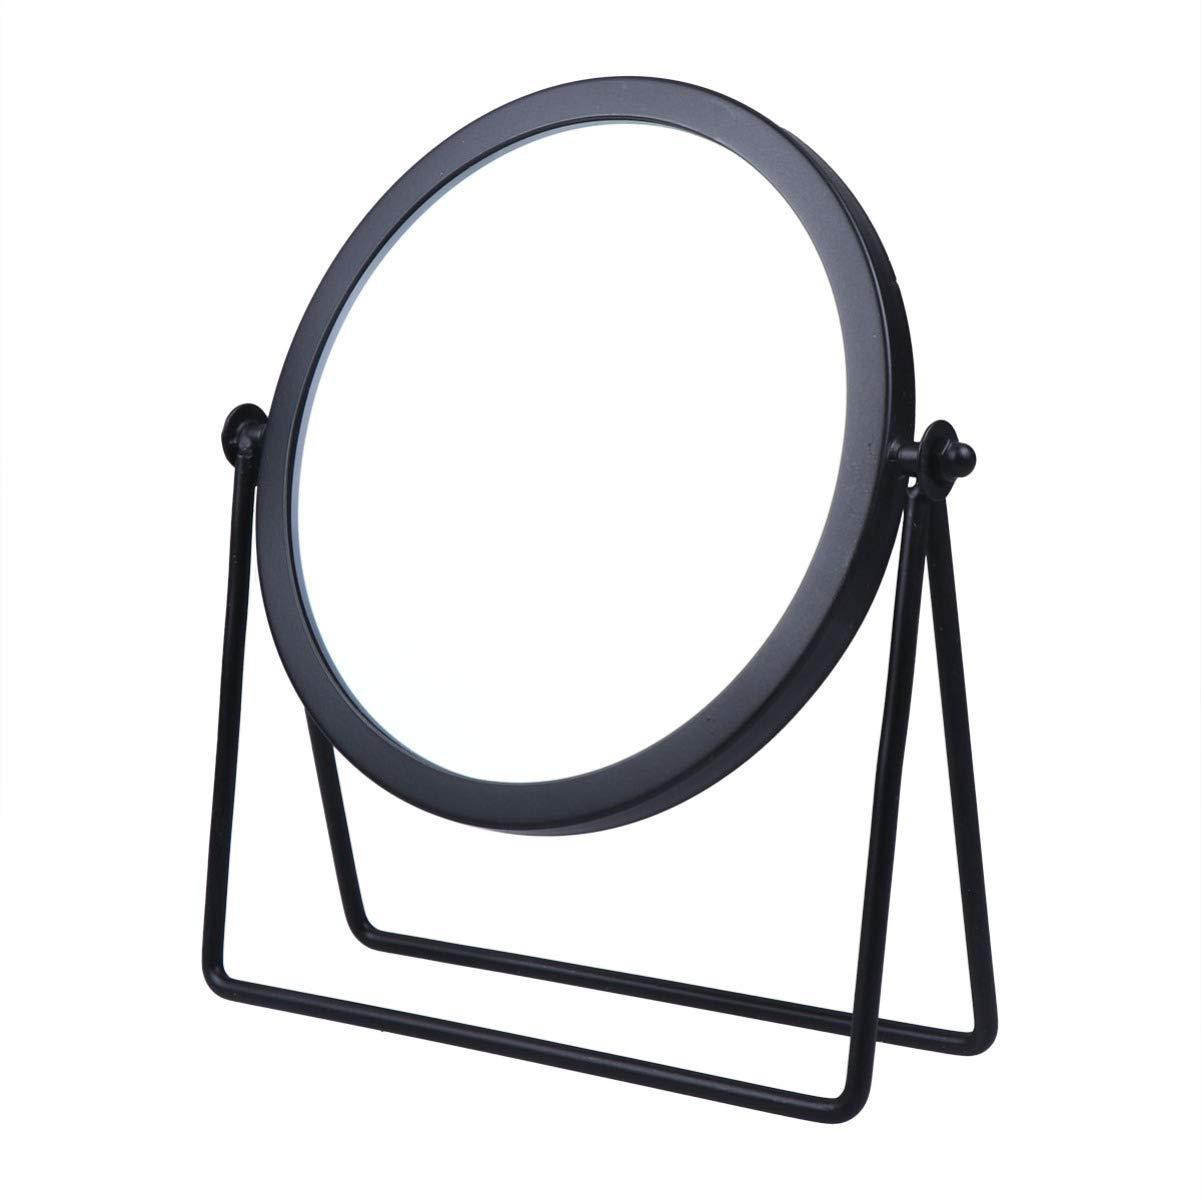 Max 50% OFF LEORX Makeup Mirror Single Sided Fram Metal Desktop Round Very popular